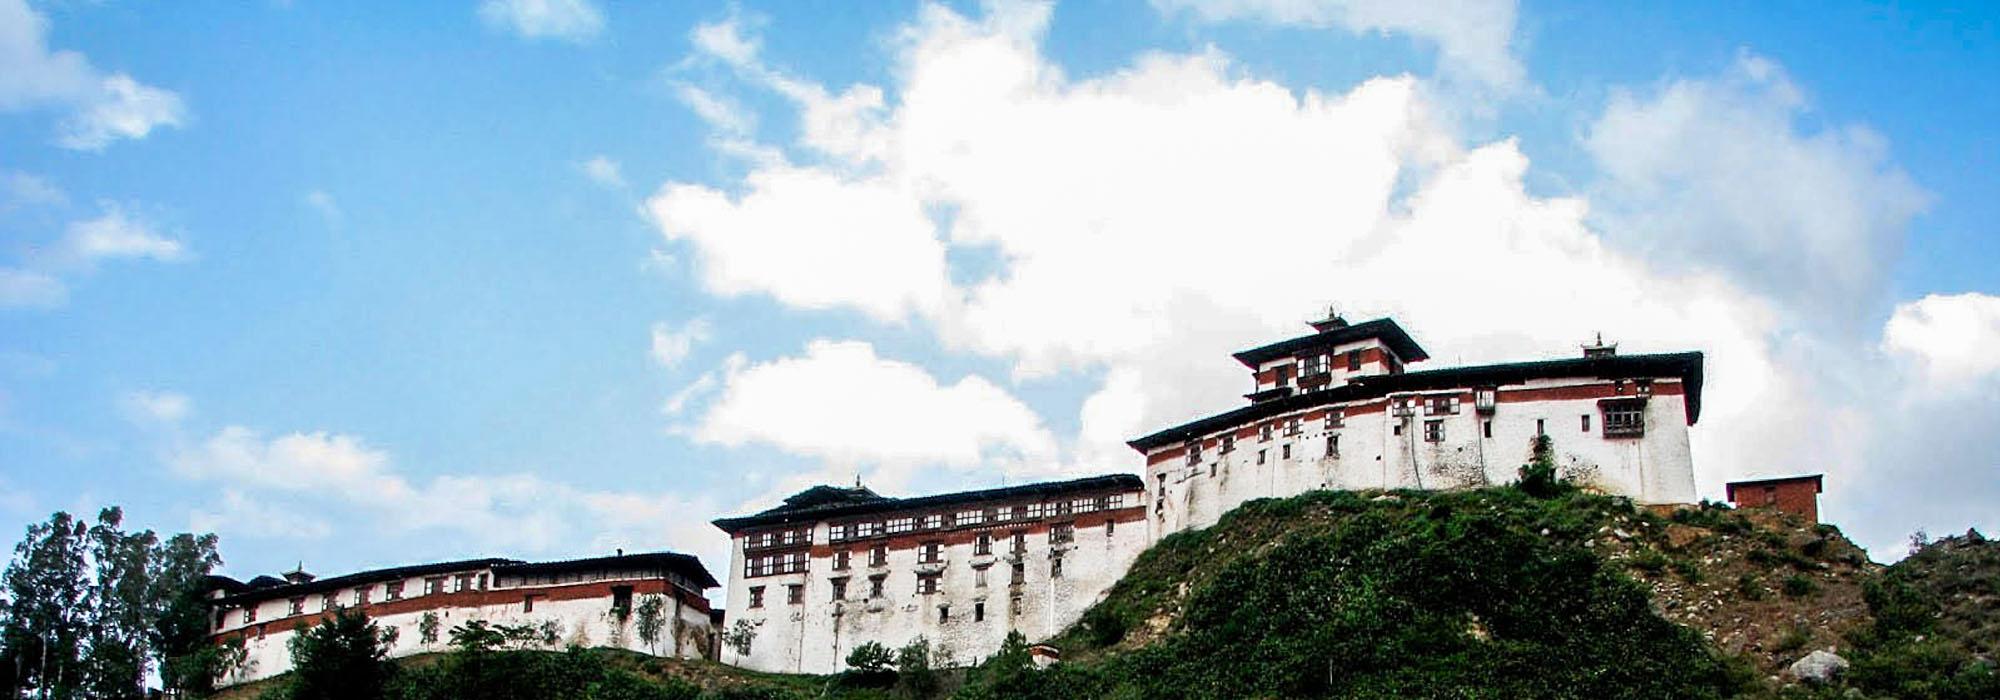 Wangduephodrang Tshechu